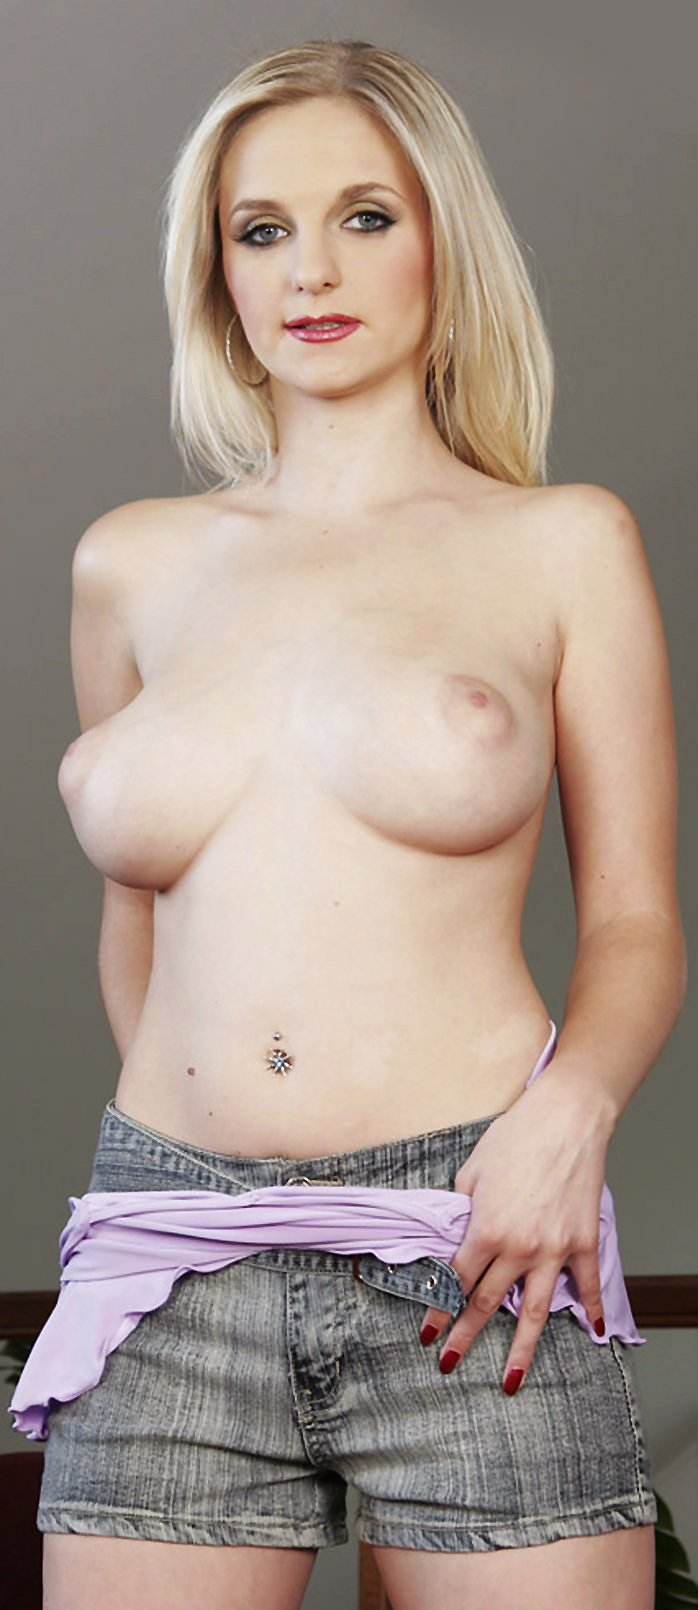 Busty blonde Darina posing naked in high heels